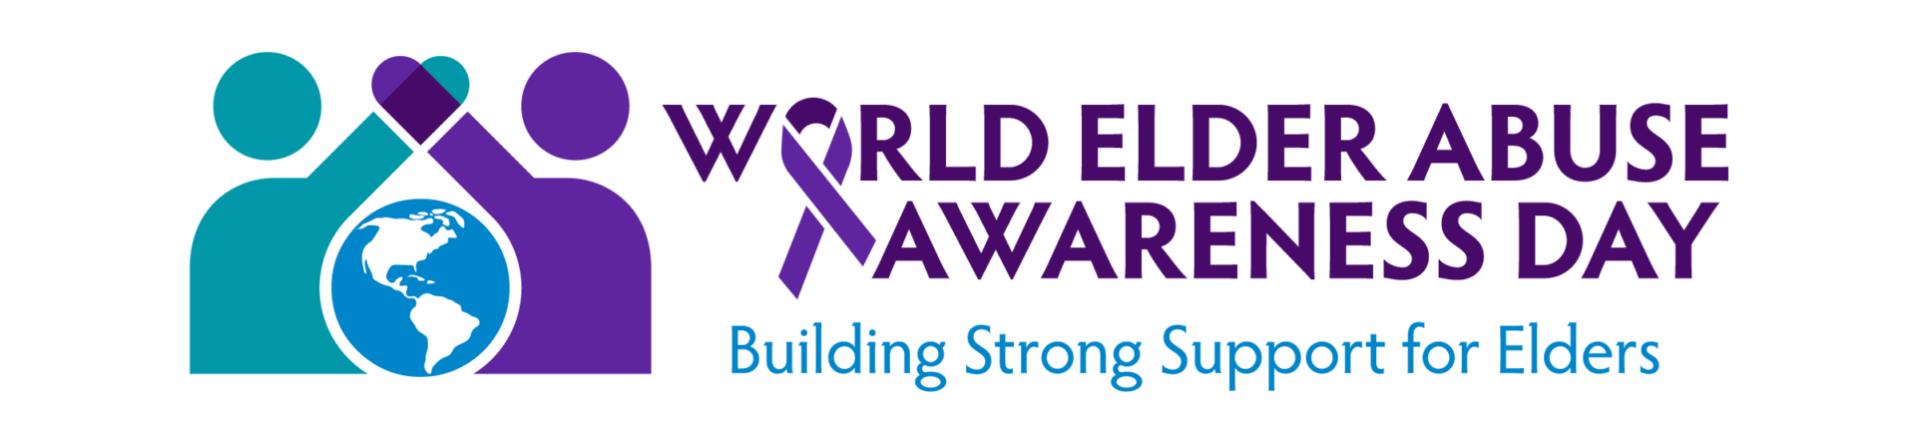 World Elder Abuse Awareness Day Thumbnail